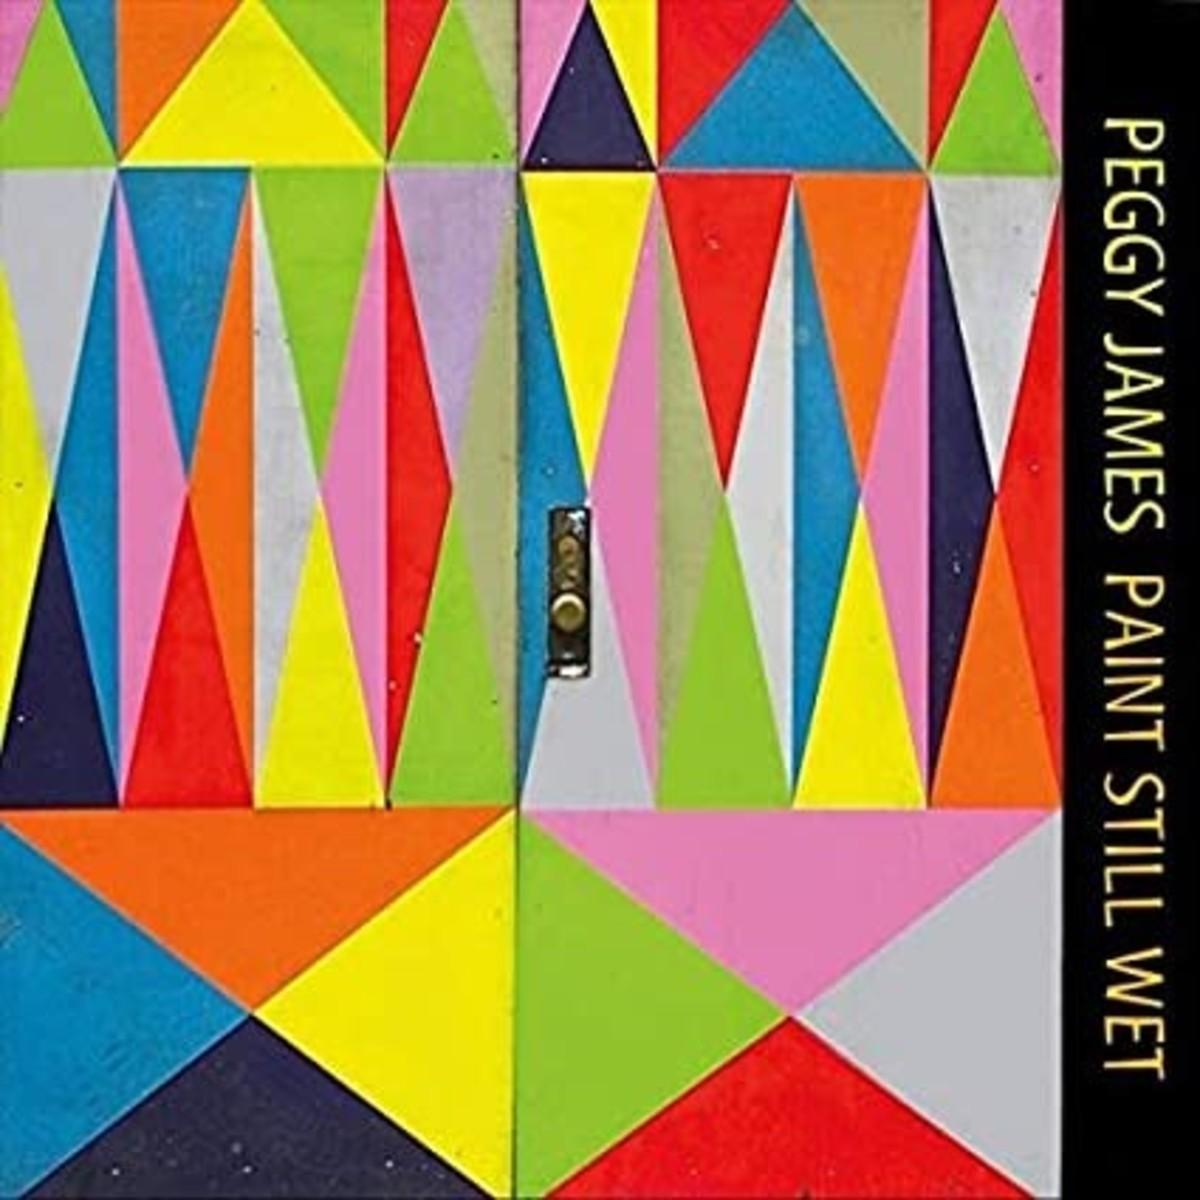 Milwaukees Peggy James CD